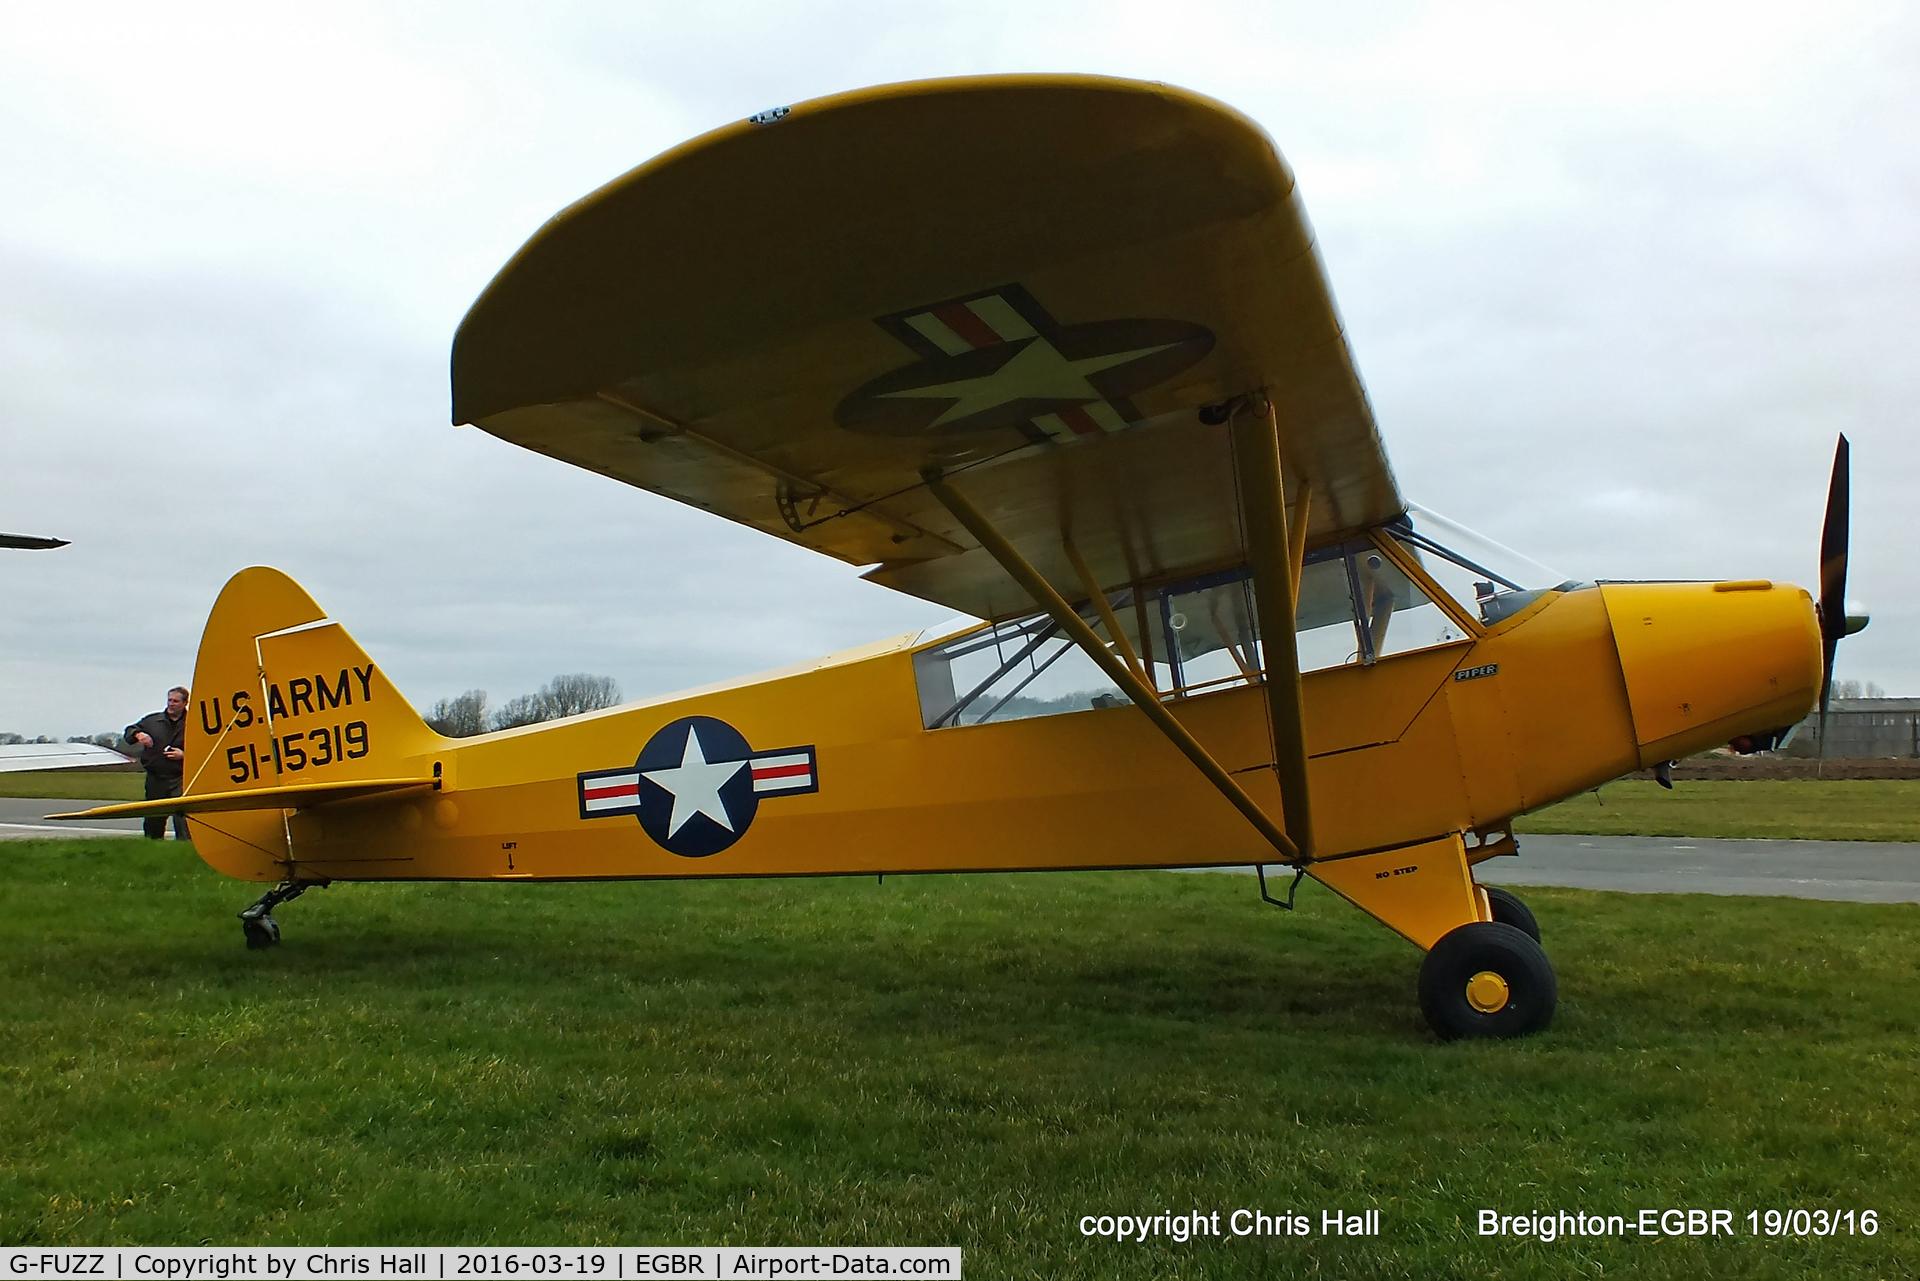 G-FUZZ, 1951 Piper L-18C Super Cub (PA-18-95) C/N 18-1016, at Breighton airfield